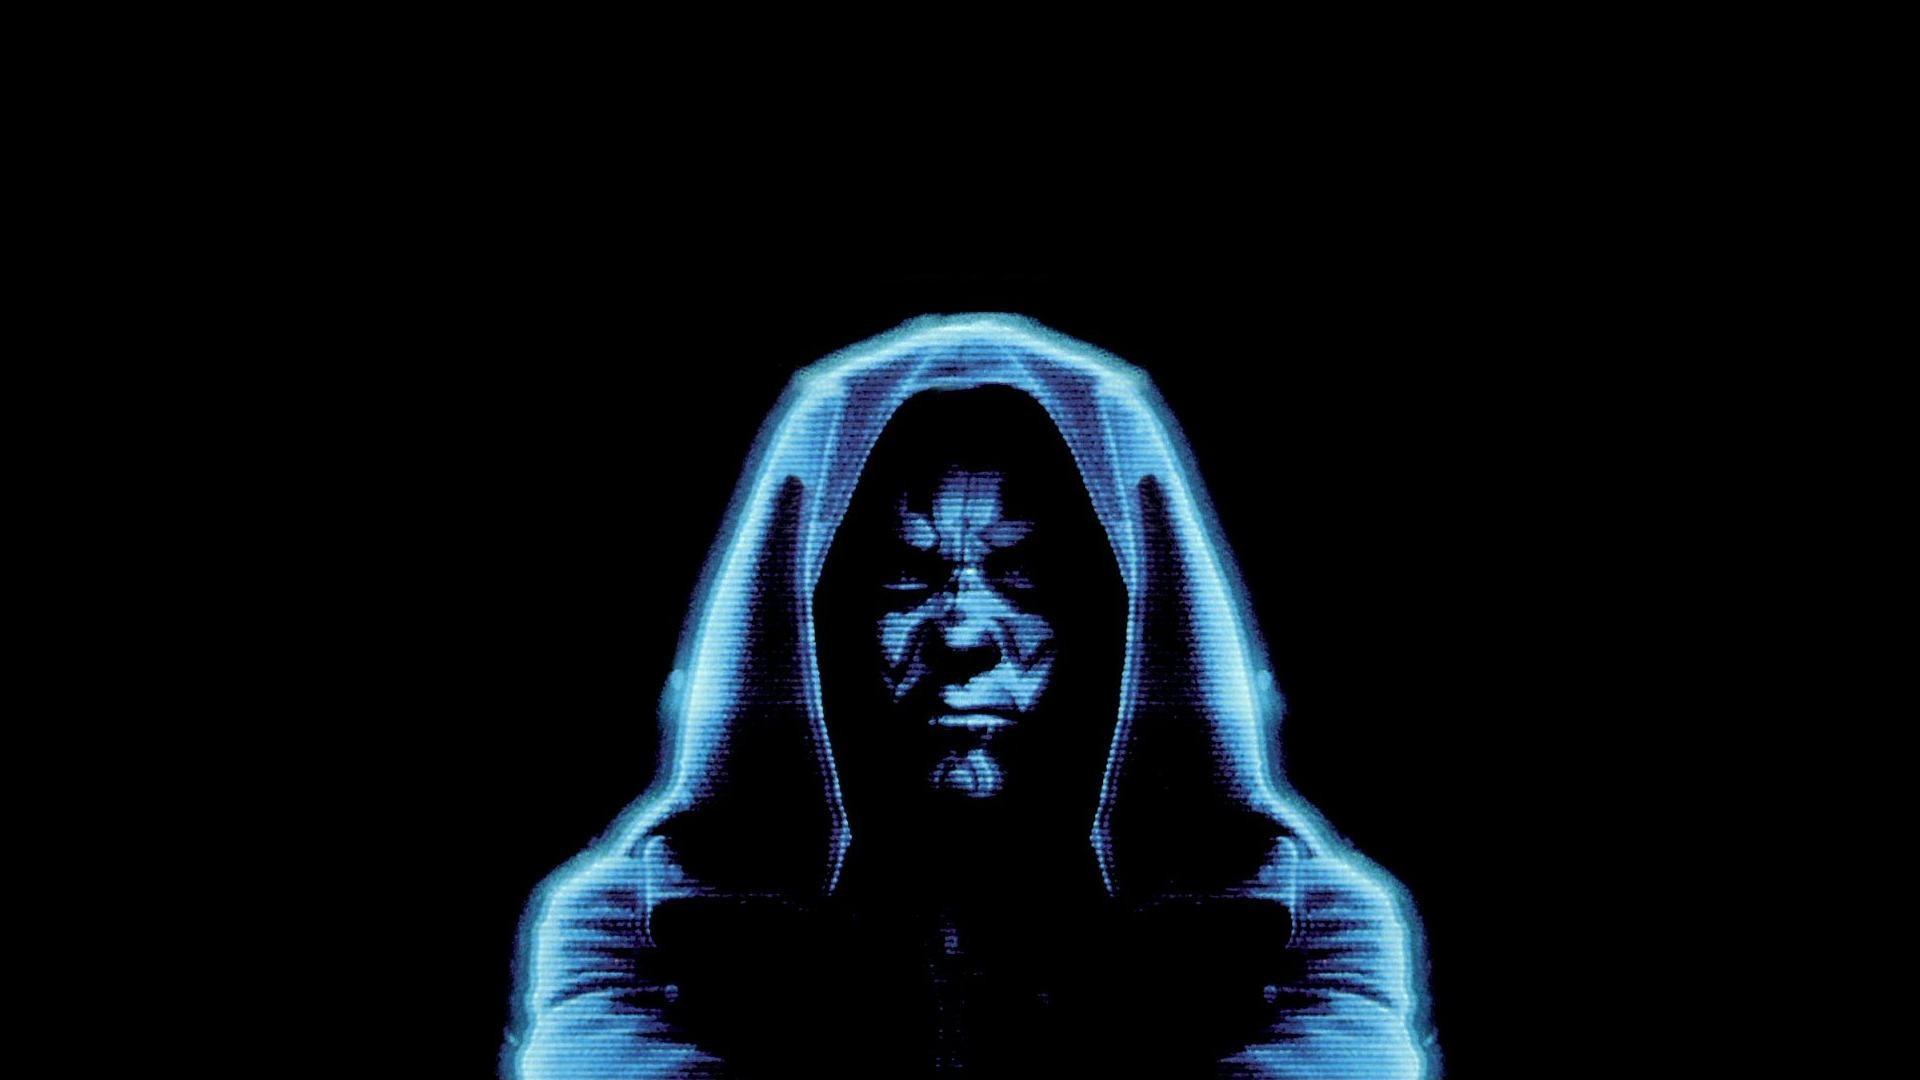 Star Wars black Darth Maul Sith black background wallpaper | |  61220 | WallpaperUP